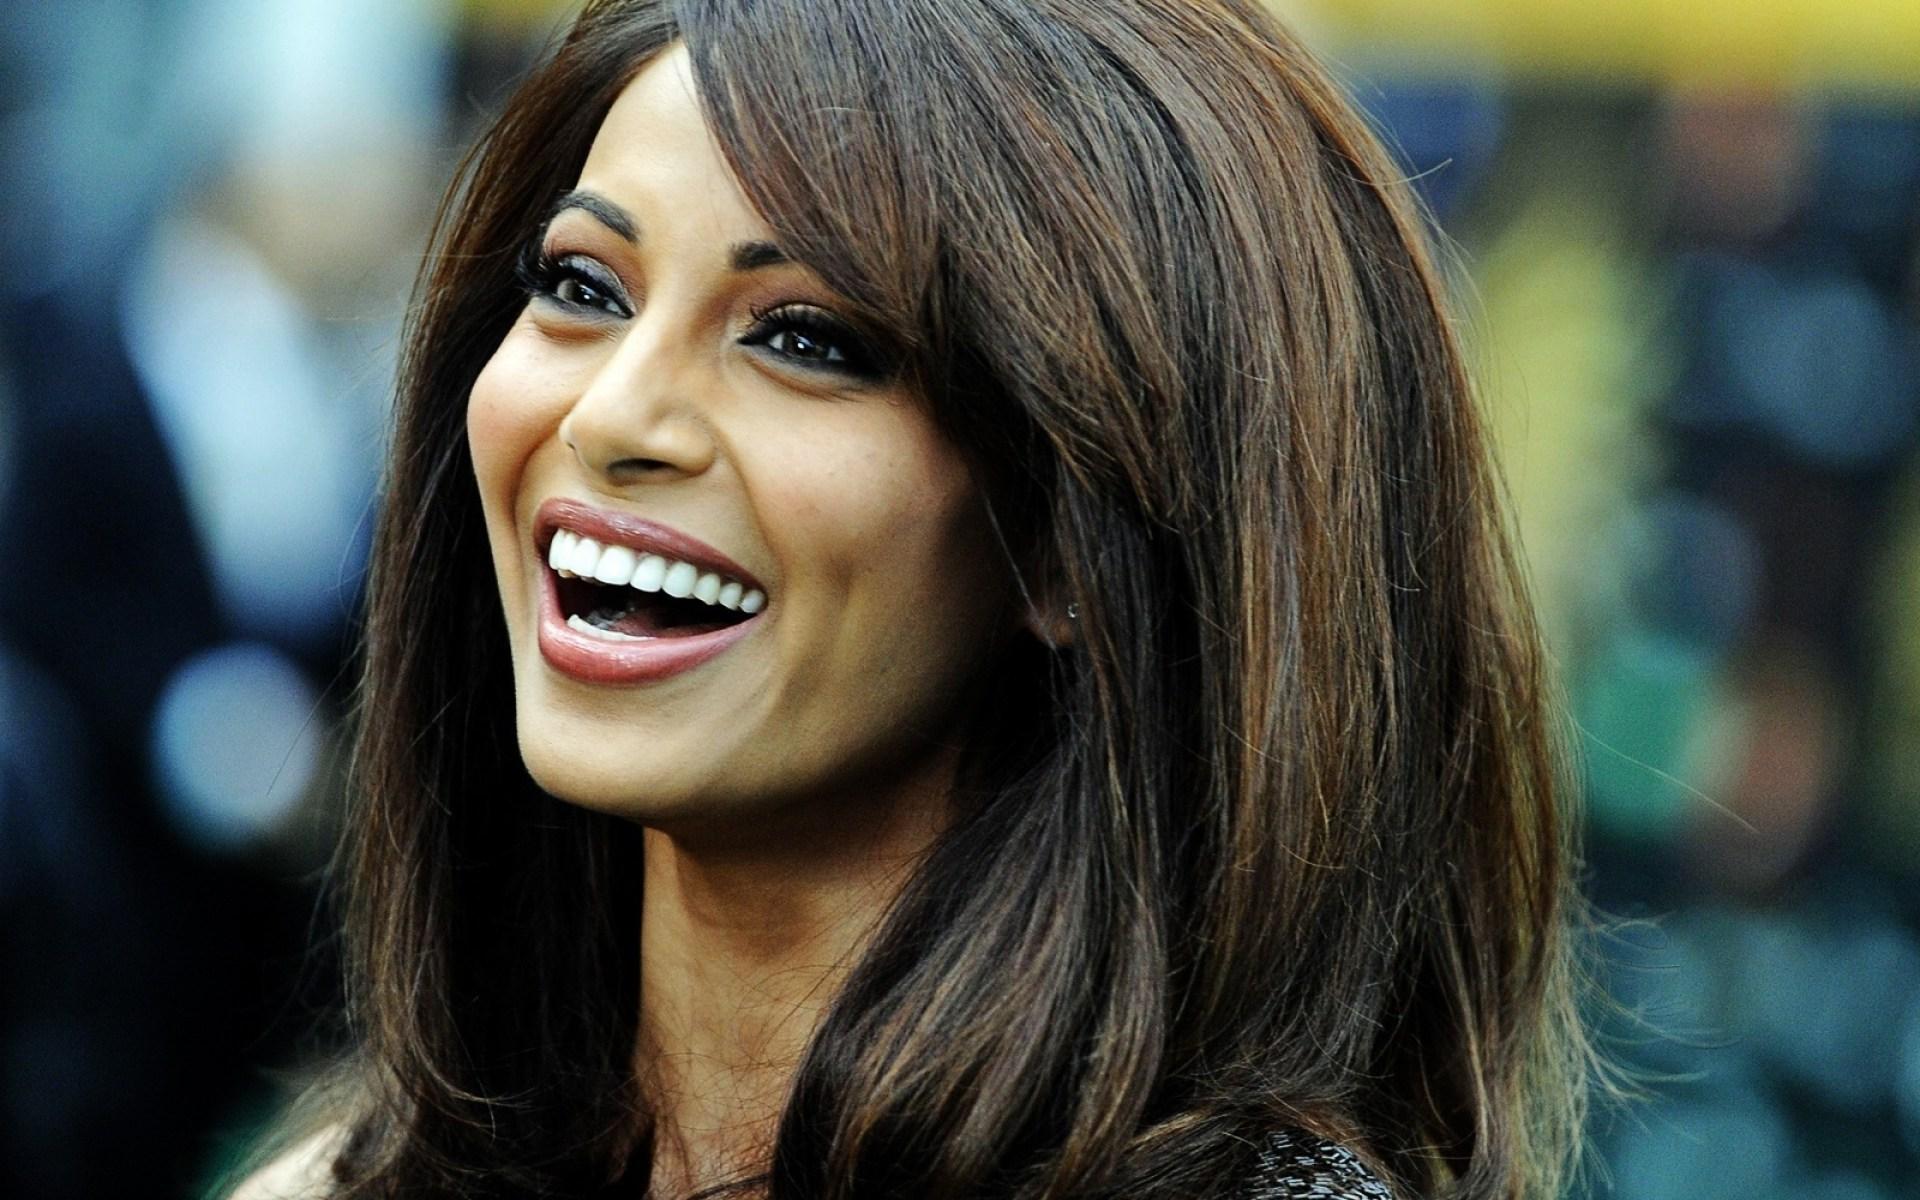 bipasha bahu hot actress and model instagran